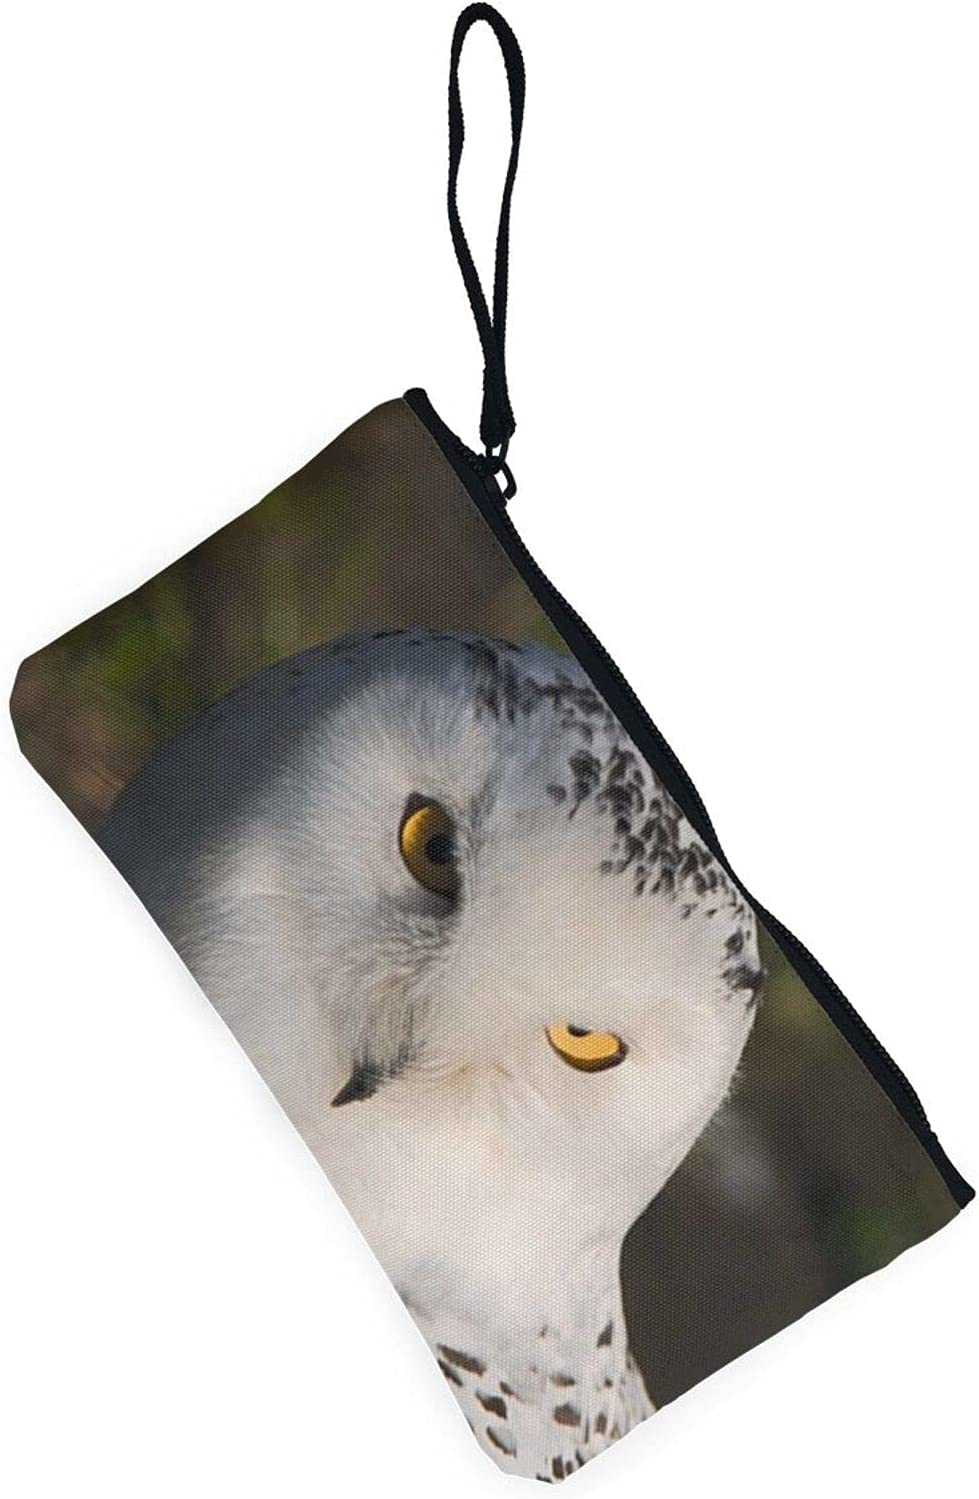 AORRUAM Snowy Owl Eyes Canvas Coin Purse,Canvas Zipper Pencil Cases,Canvas Change Purse Pouch Mini Wallet Coin Bag